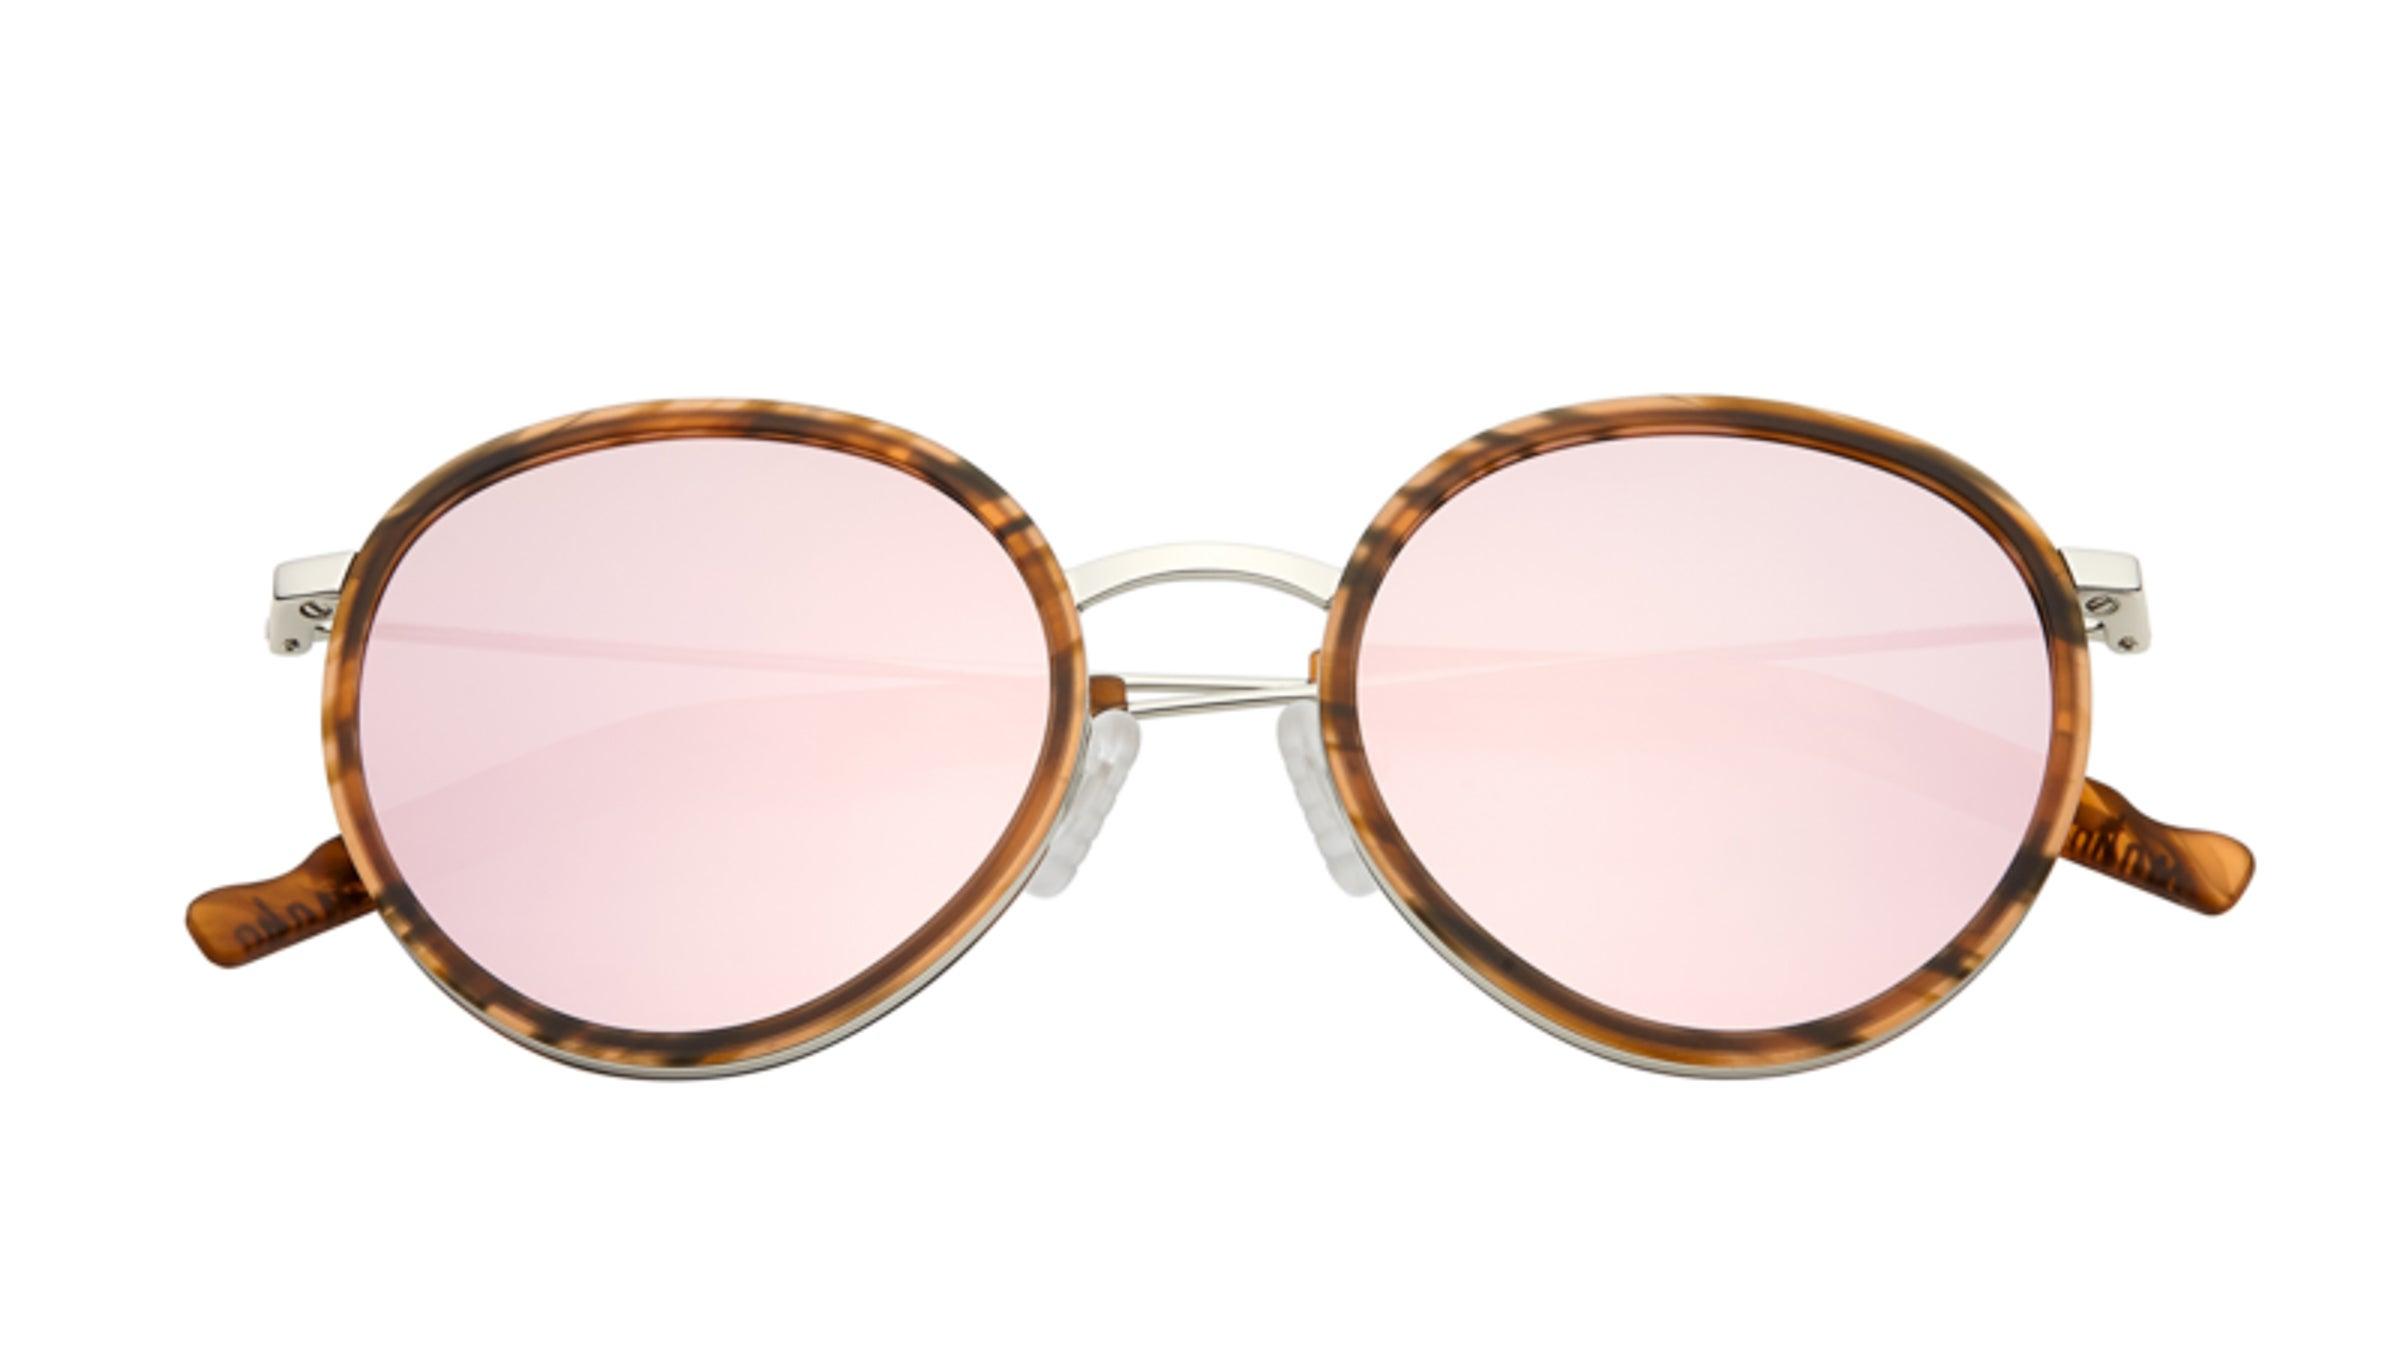 Cabo 2 Whisky sunglasses